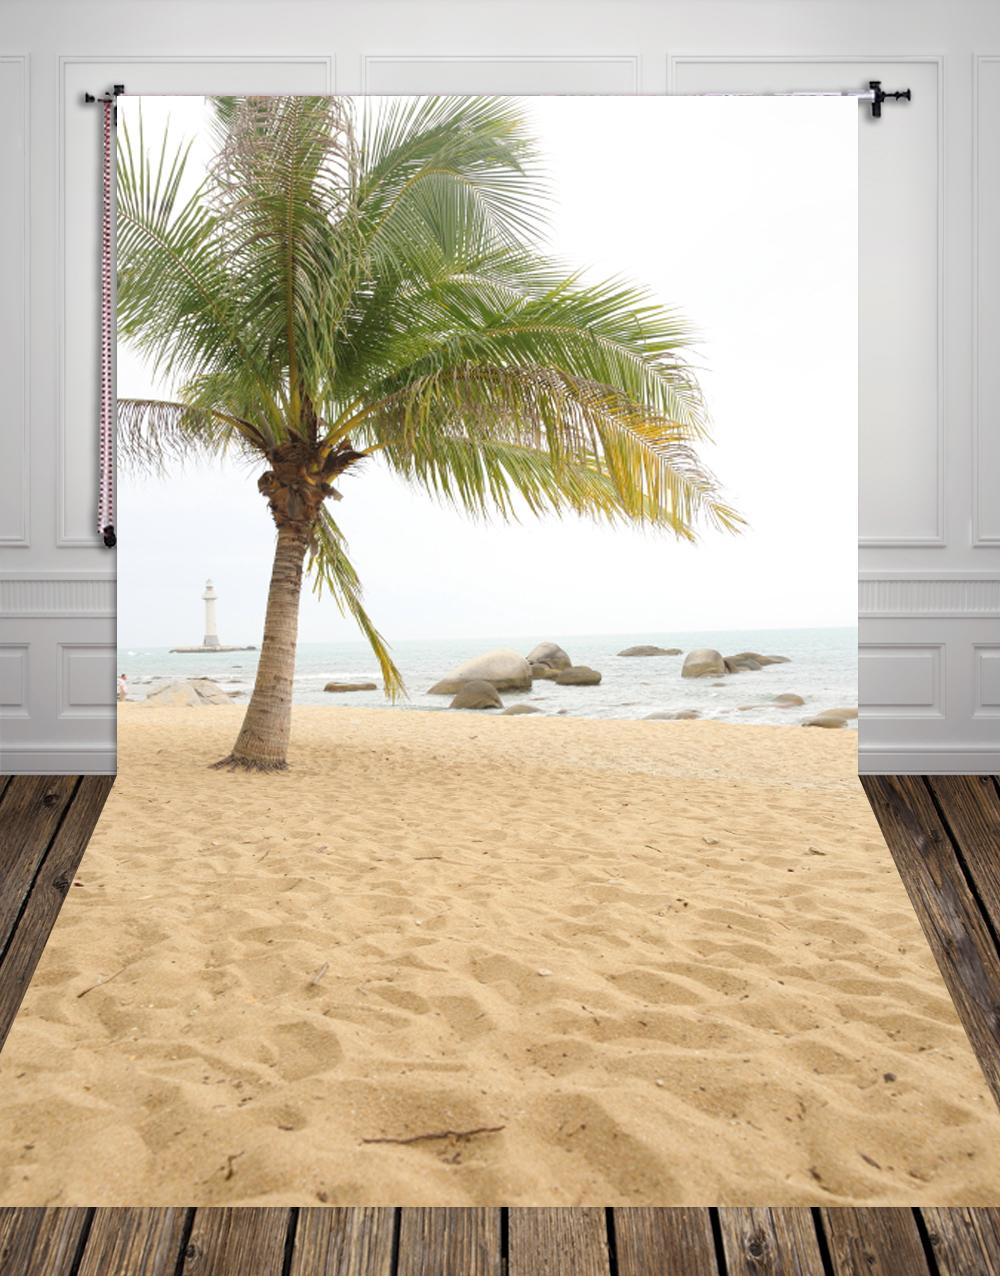 Backdrop bãi cát đẹp